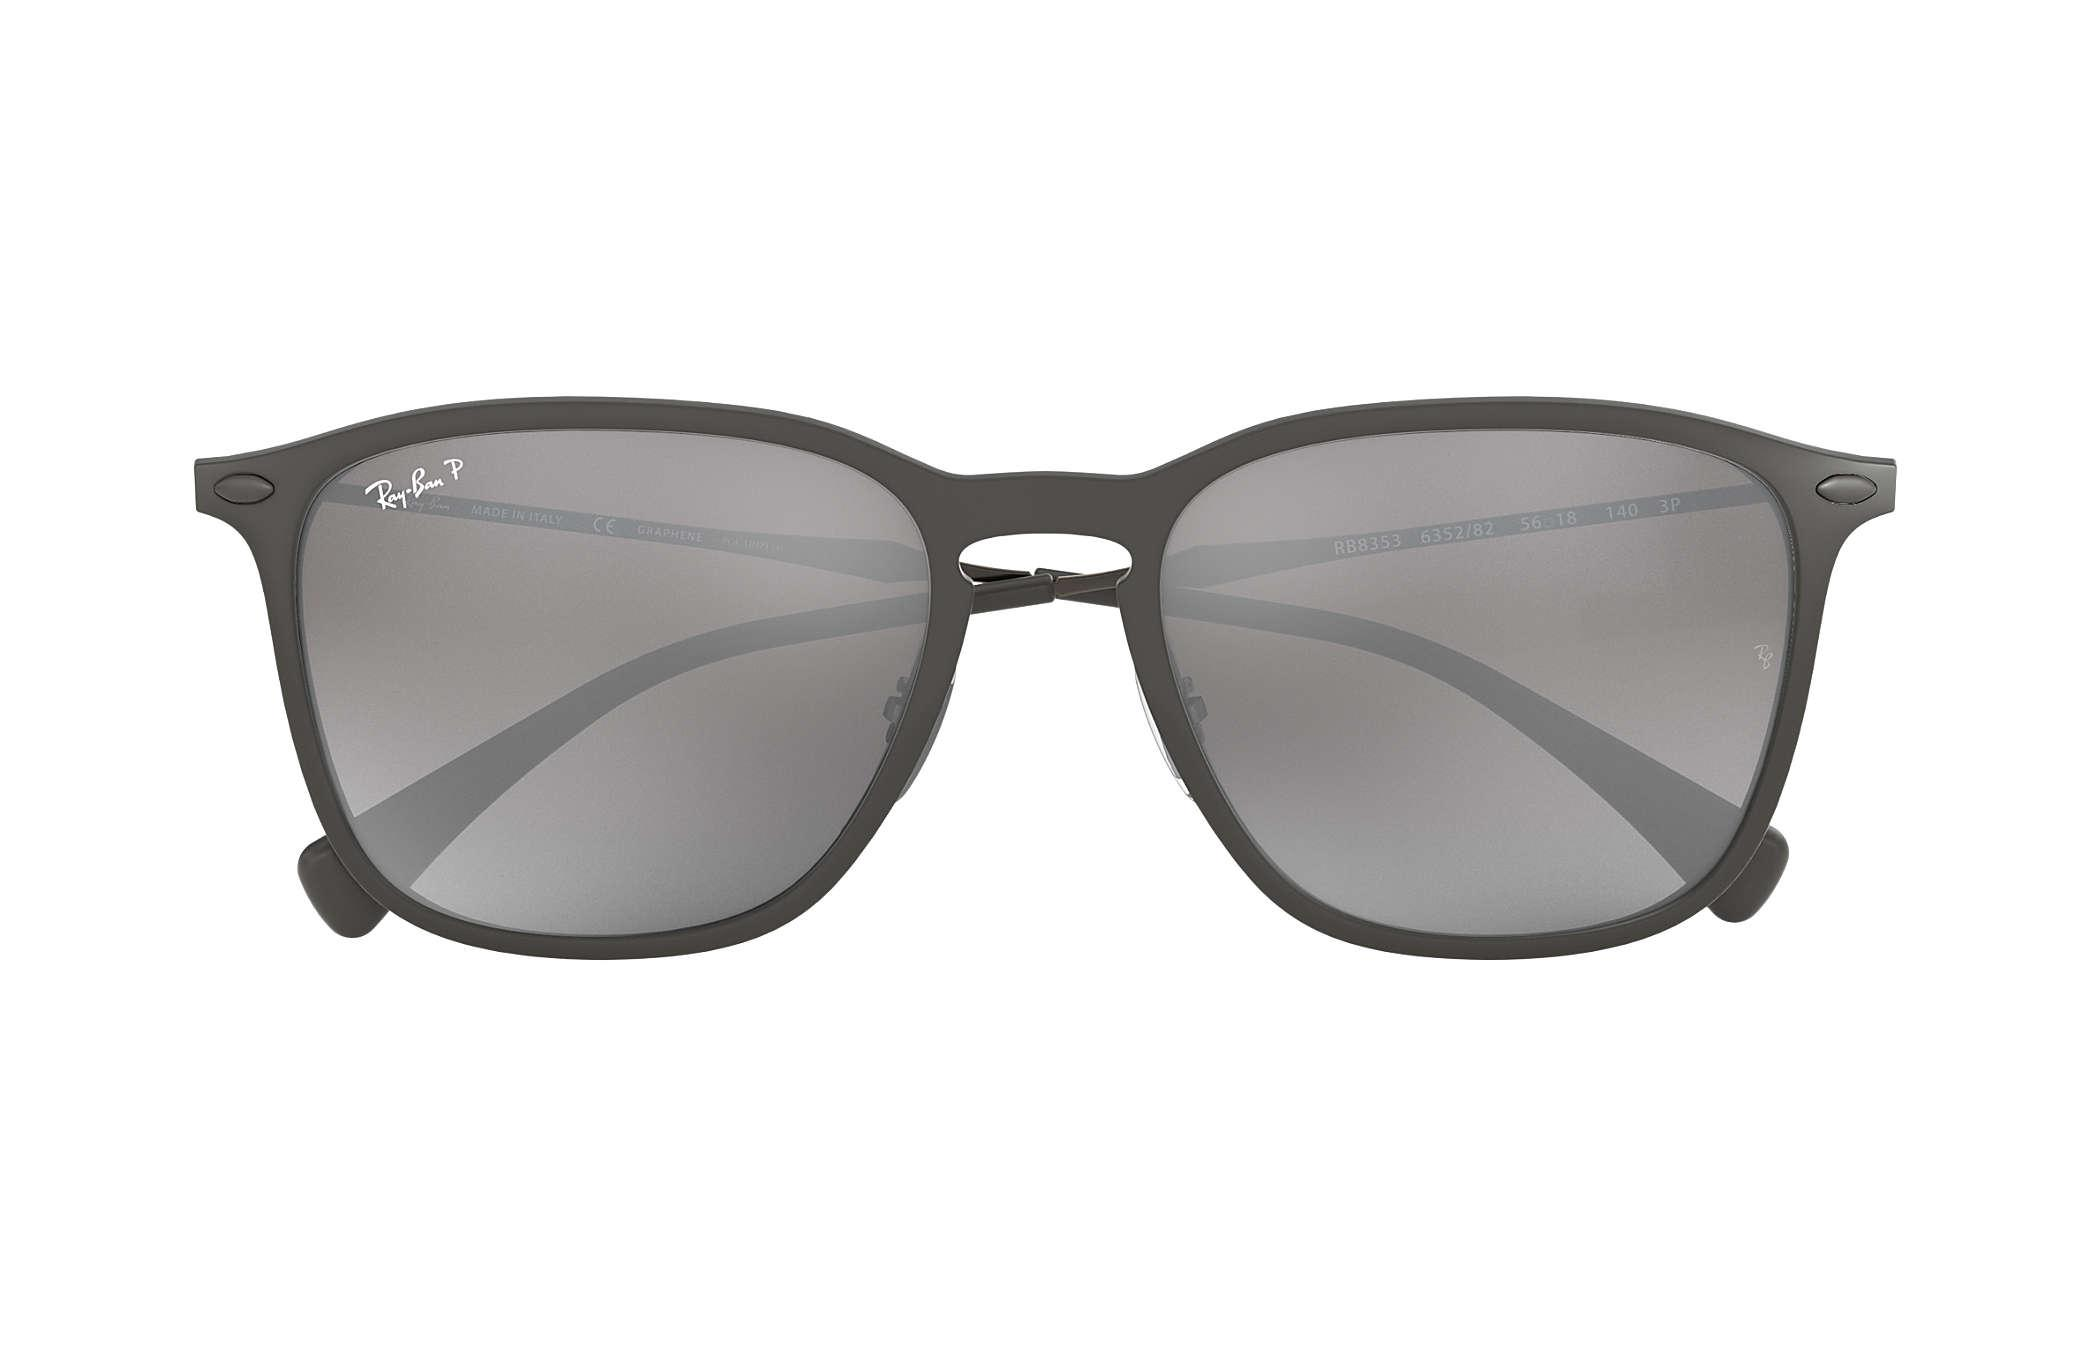 0cd7c4b980f Ray-Ban - Gray Rb8353 for Men - Lyst. View fullscreen